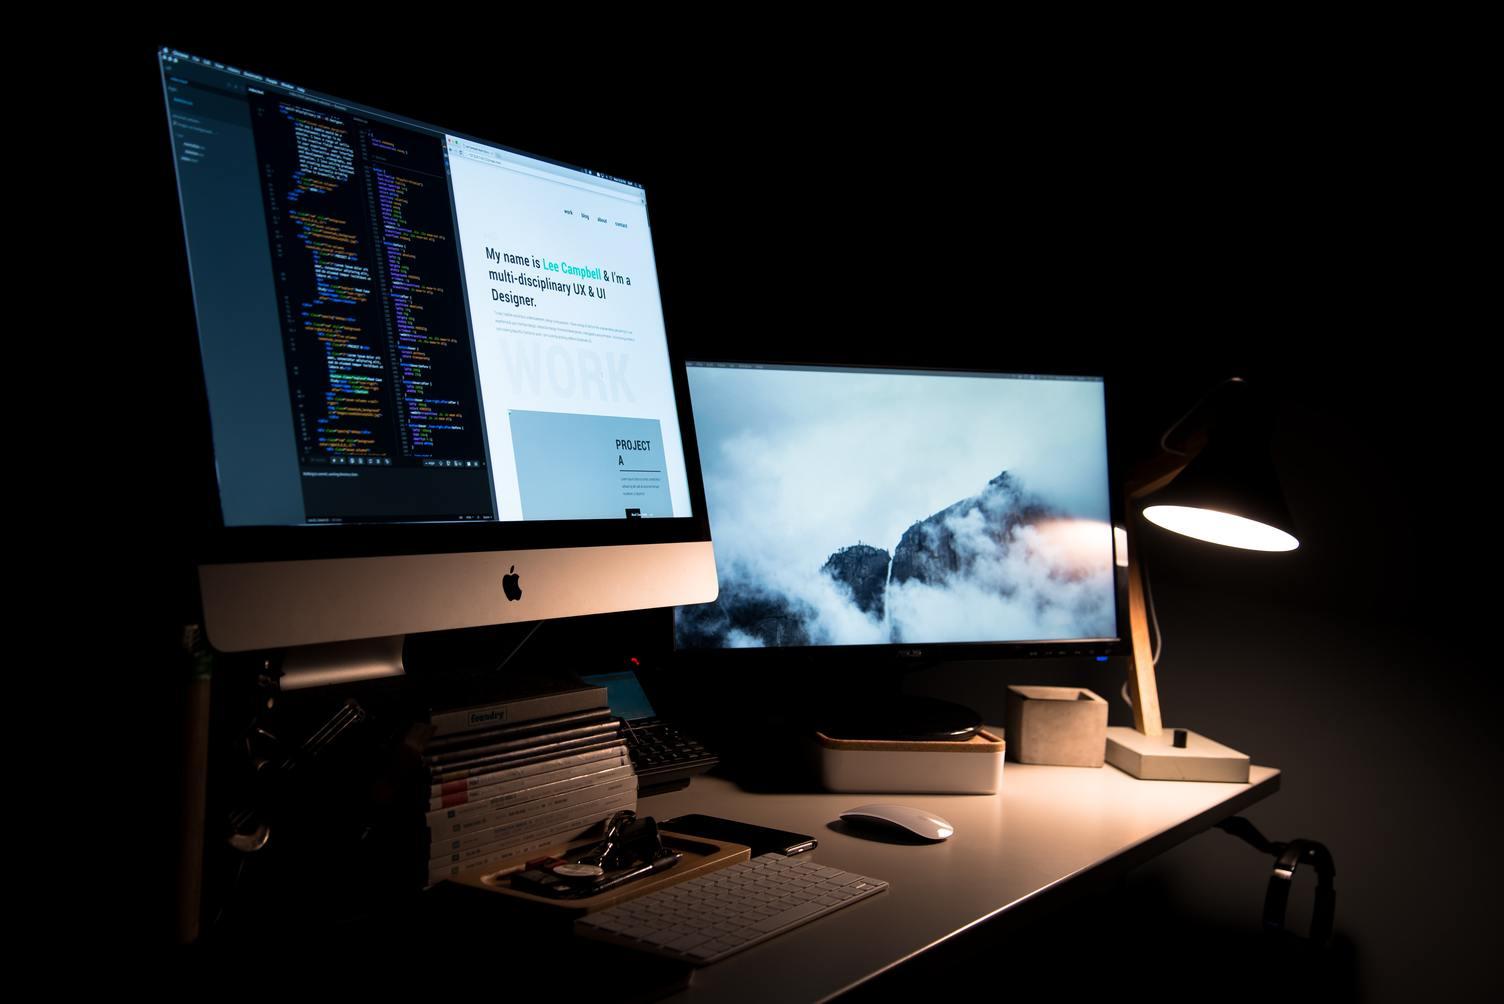 web designer computer screens